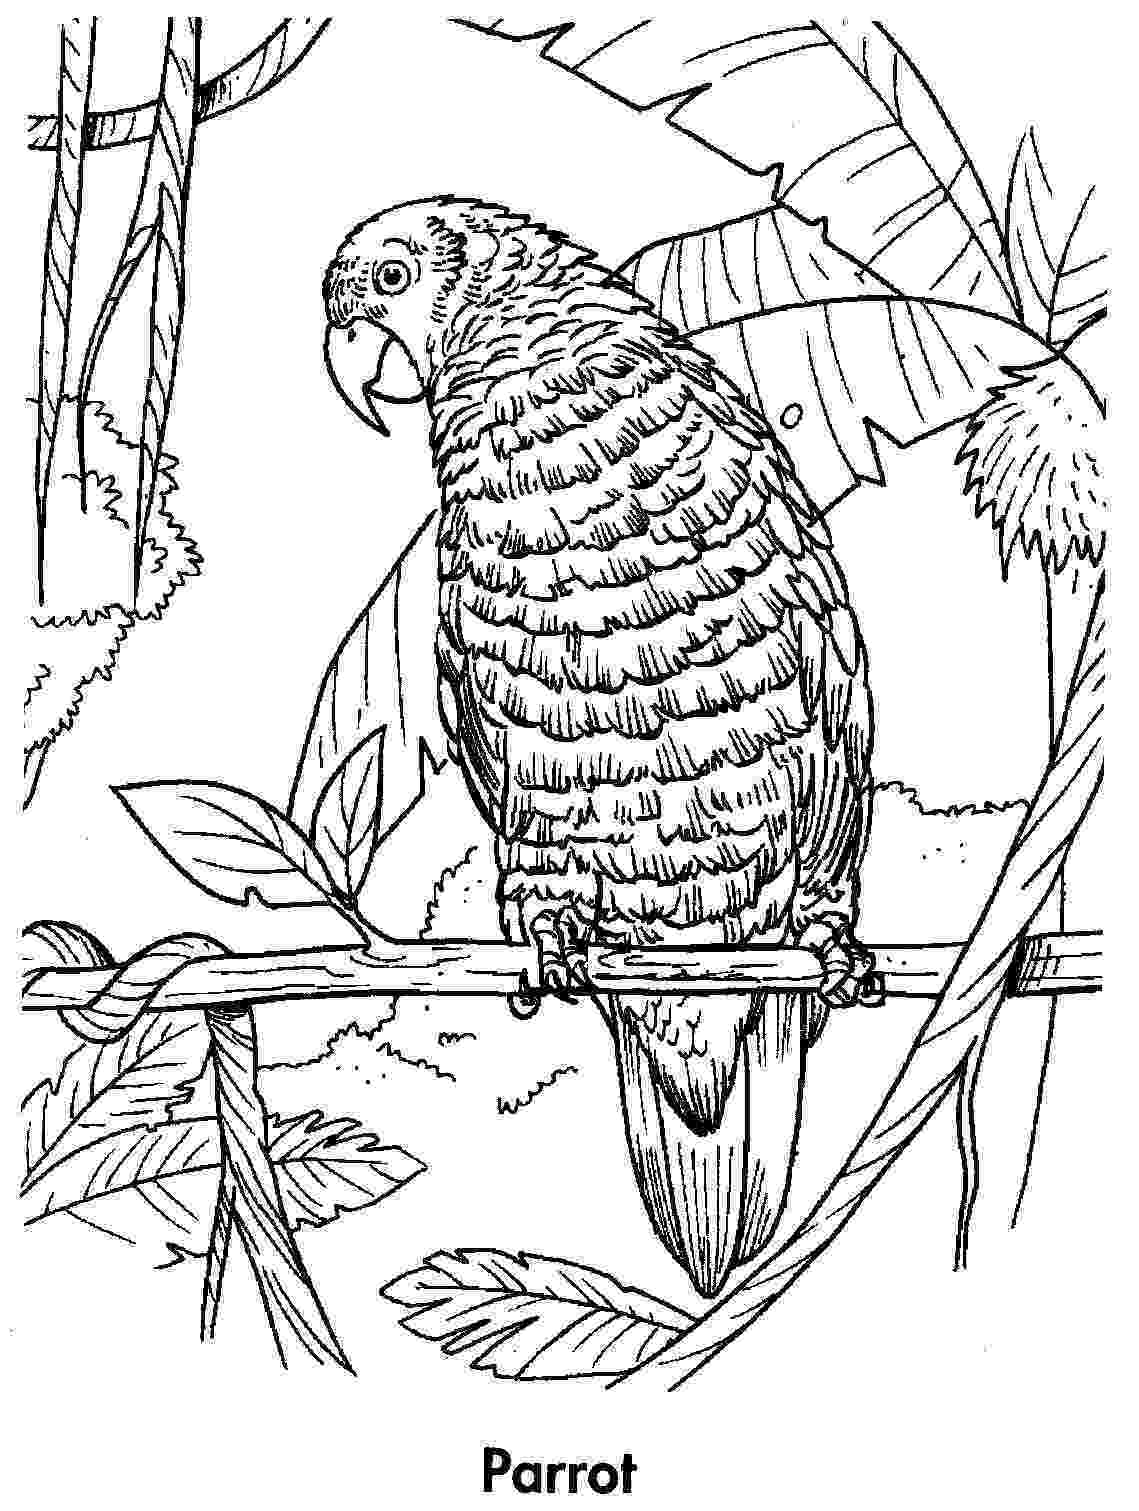 coloring pages parrot printable parrot coloring pages for kids cool2bkids parrot pages coloring